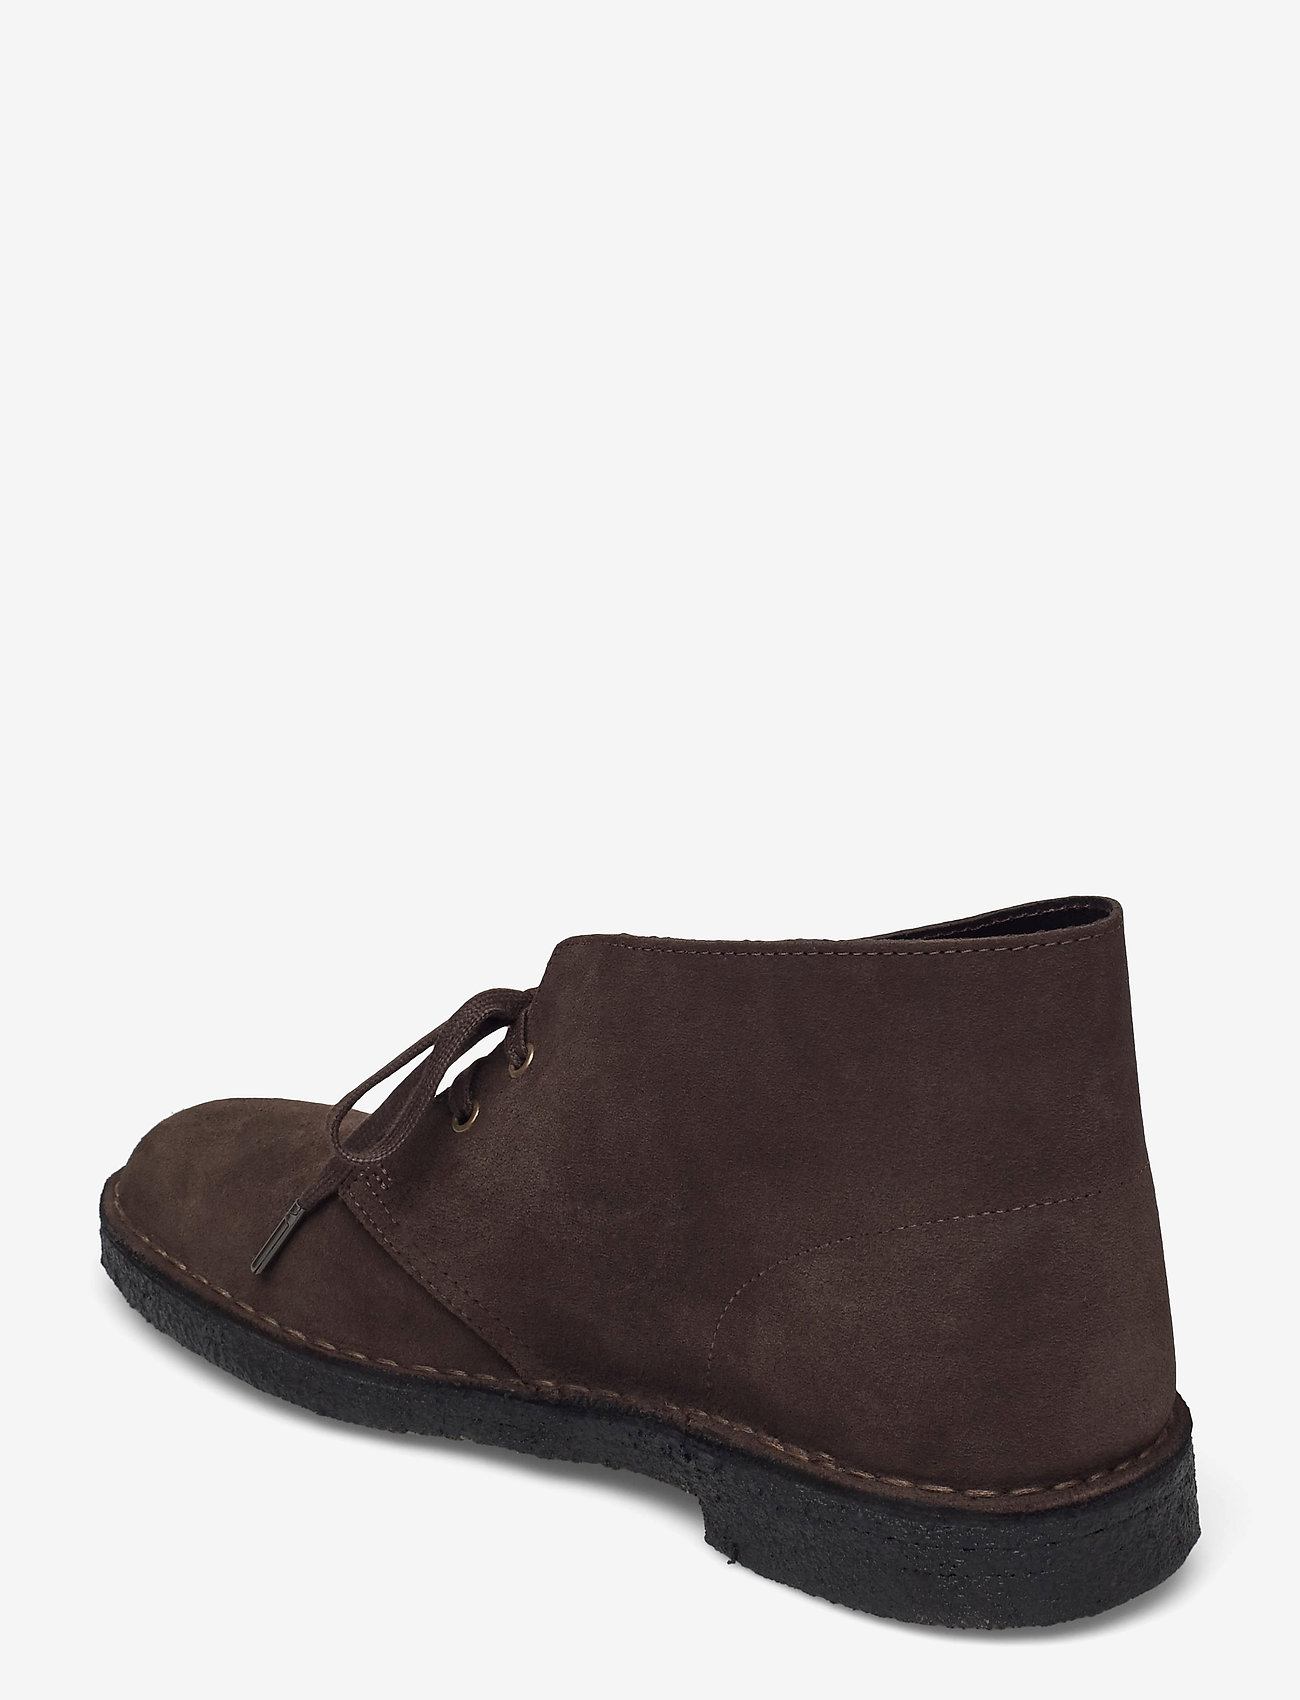 Clarks Originals - Desert Boot - Ökenkängor - brown sde - 2